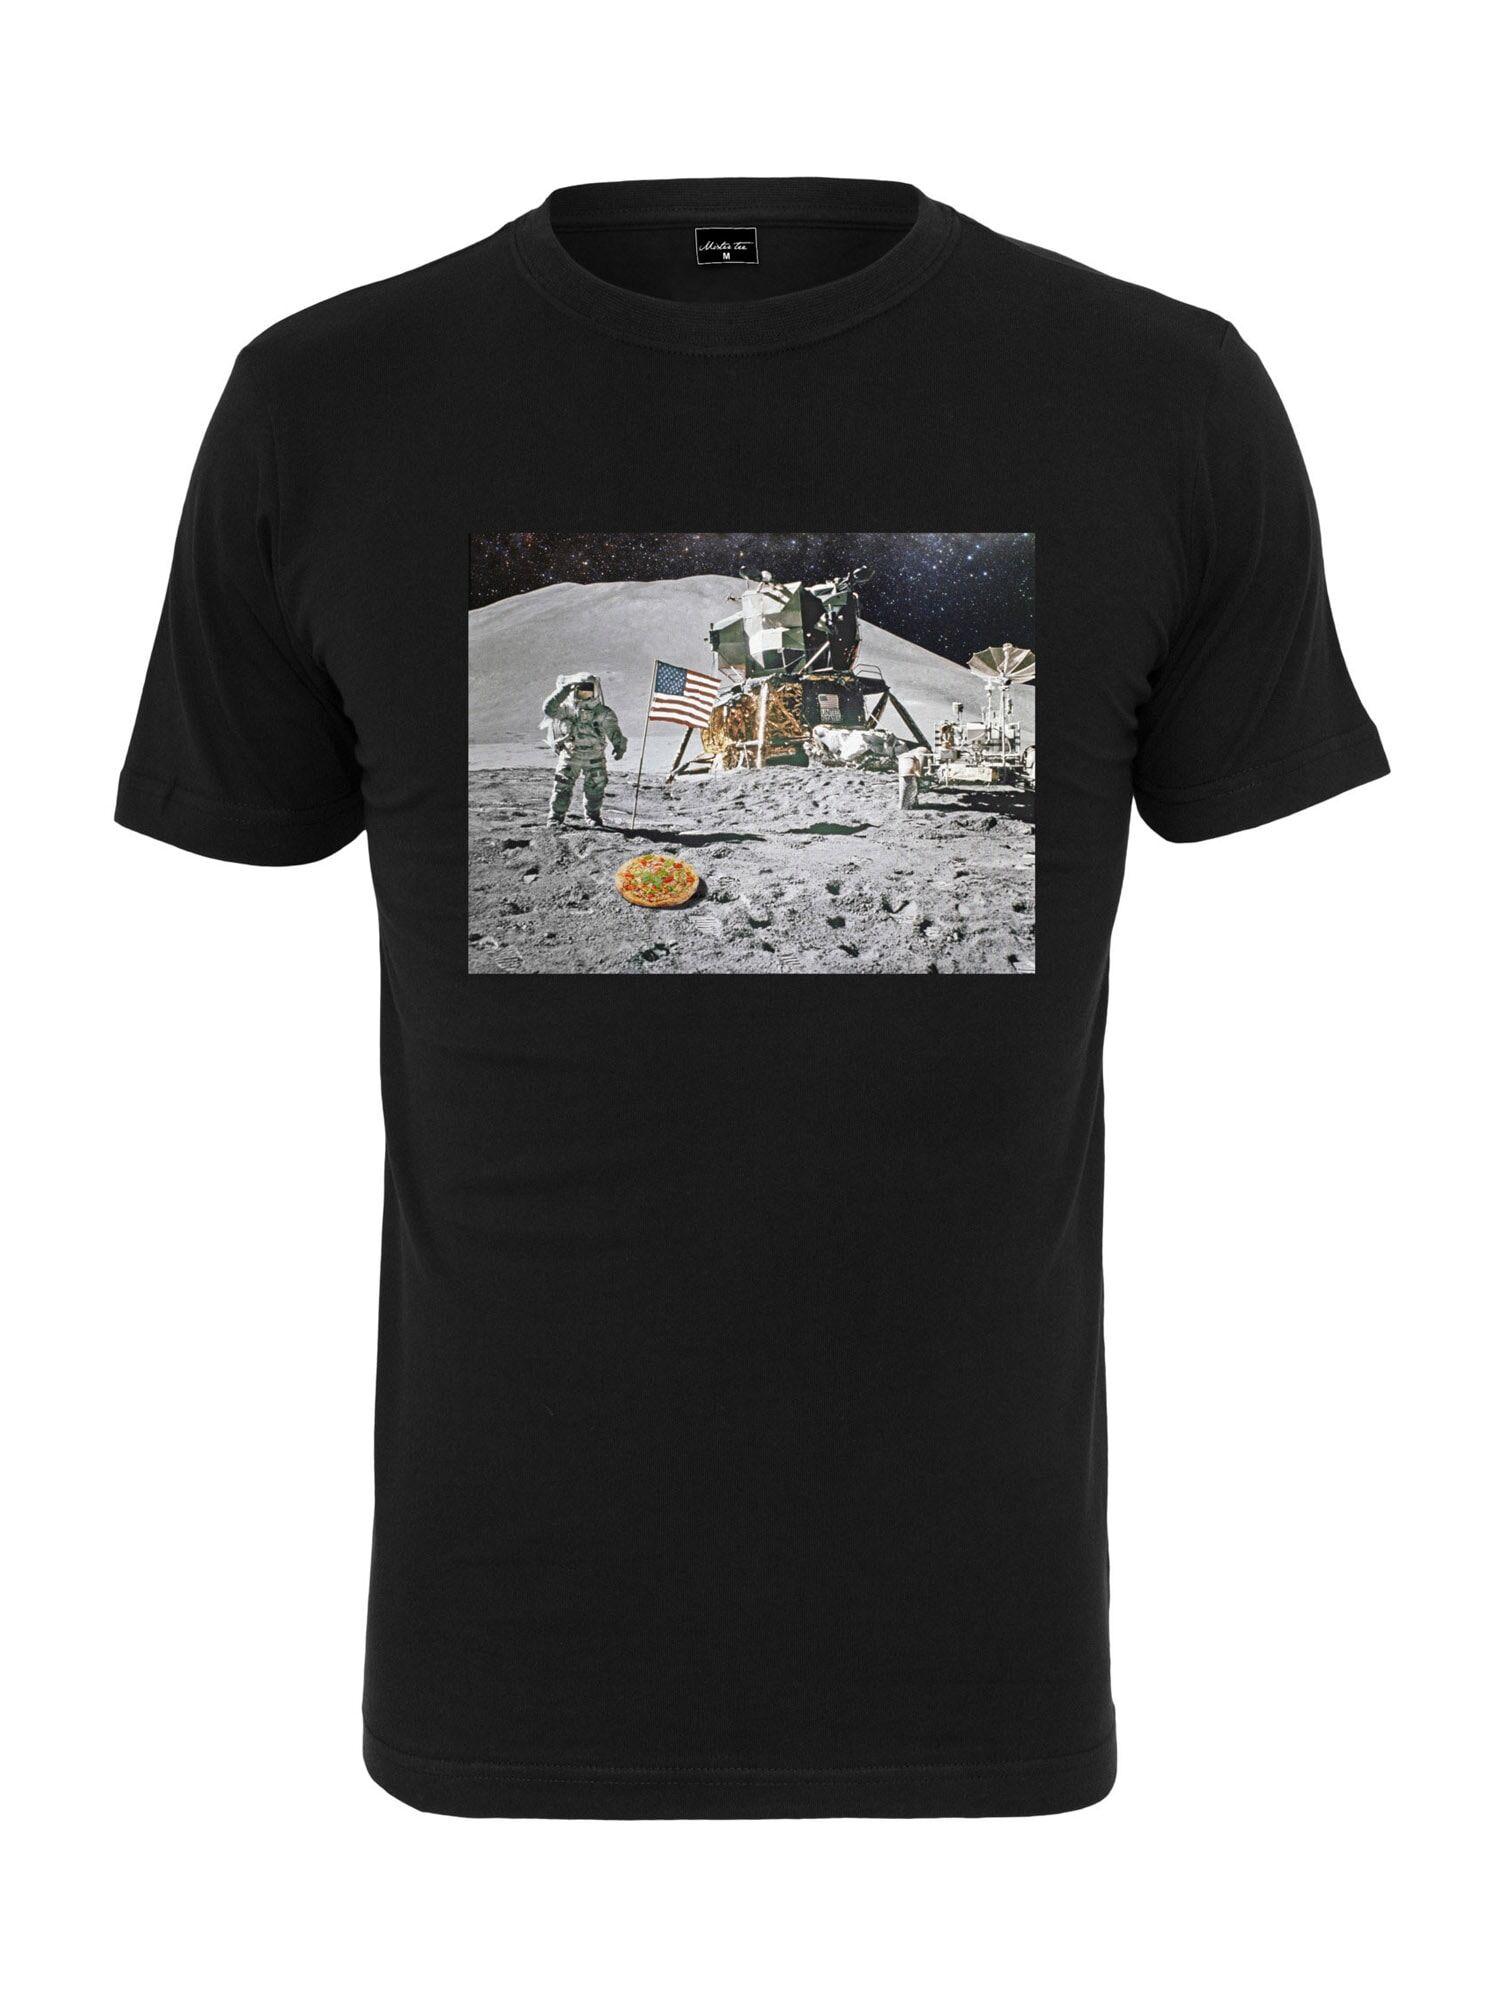 Tee T-Shirt 'Pizza Moon Landing'  - Noir - Taille: XS - male